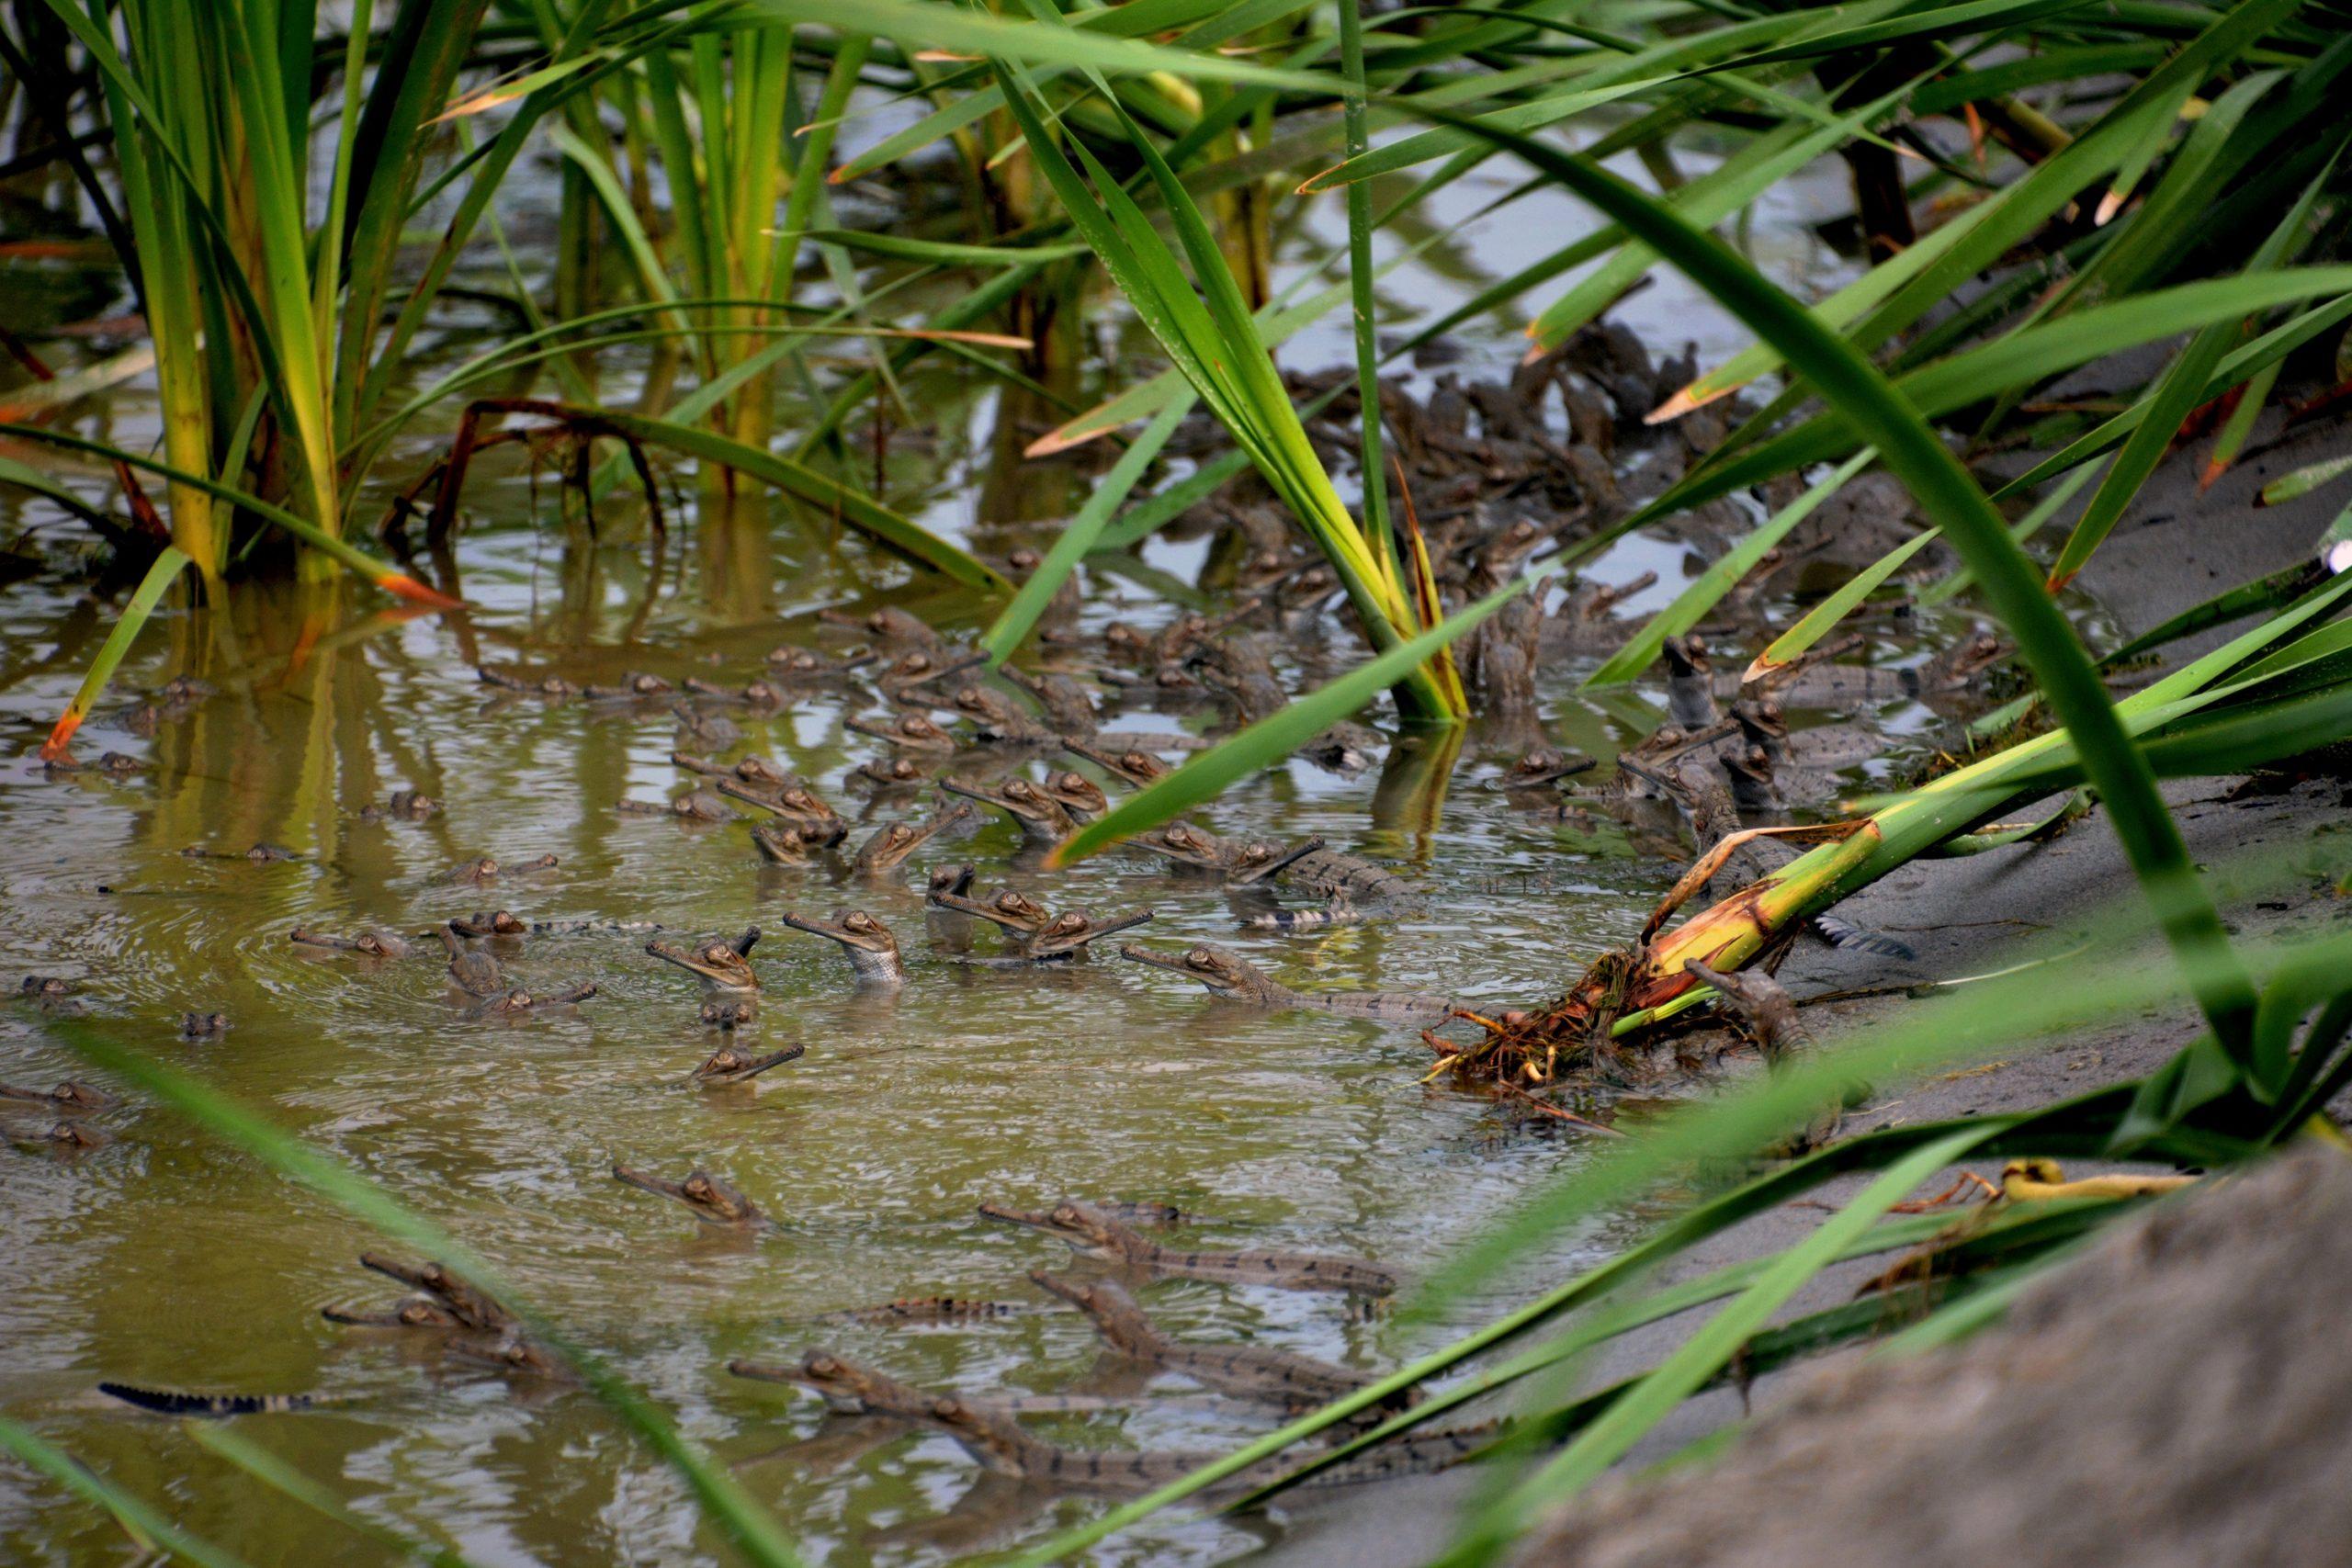 Gharial hatchlings. Photo by Gaurav Vashistha.